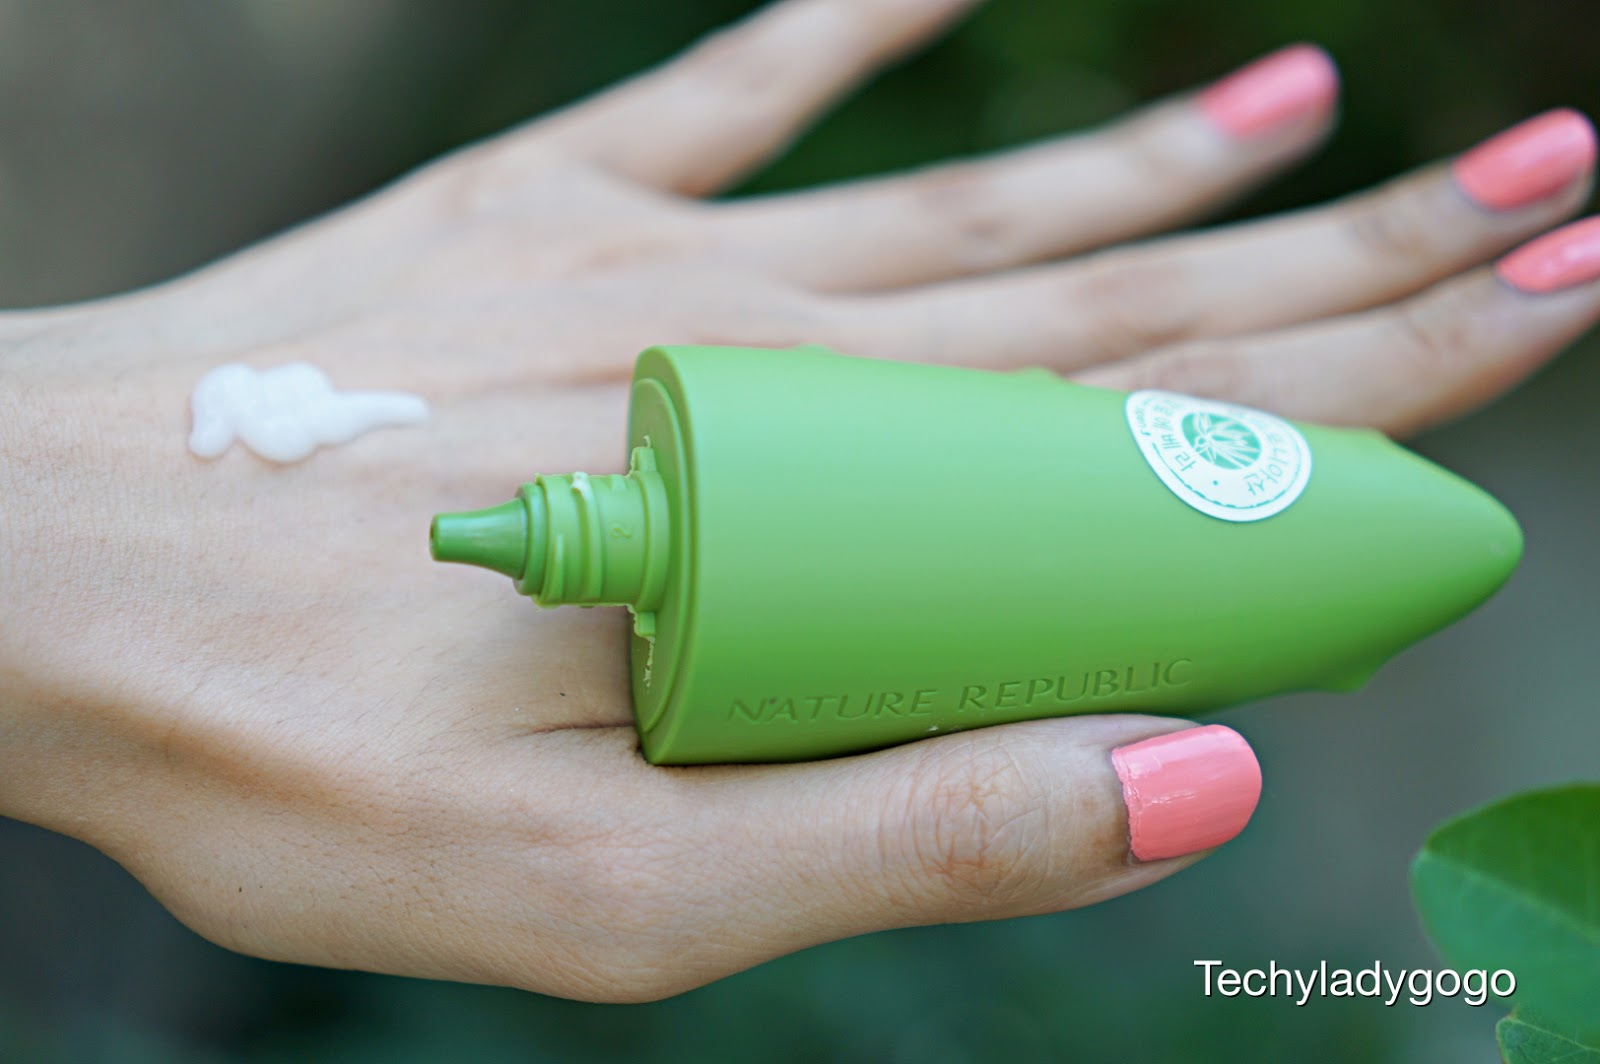 Nature Republic California Aloe Vera Hand Cream แฮนด์ครีมสูตรว่านหางจระเข้ ครีมทามือมาพร้อมแพคเกจเก๋ๆ